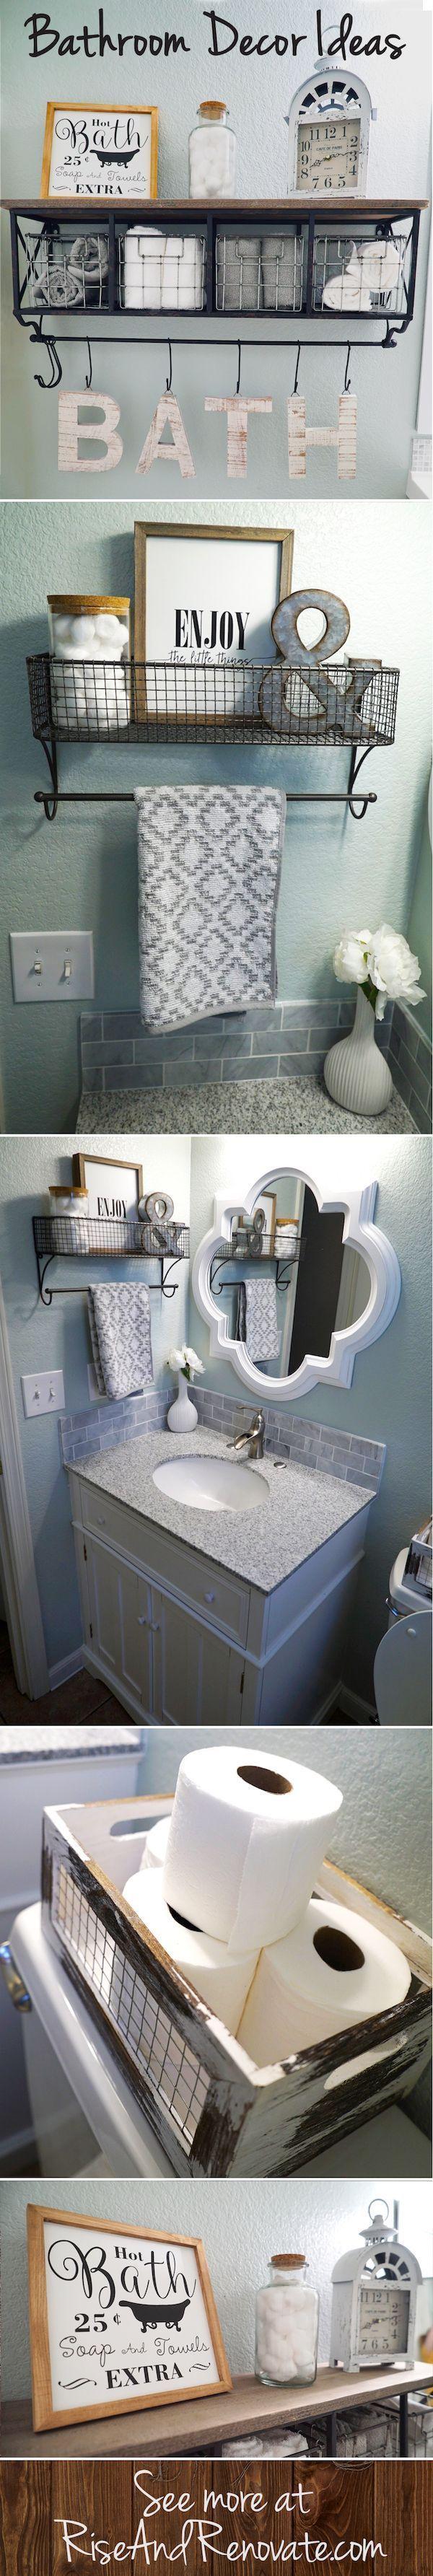 Bathroom Makeover with Vinyl Floor, Renovation Tips, Hello Hayley